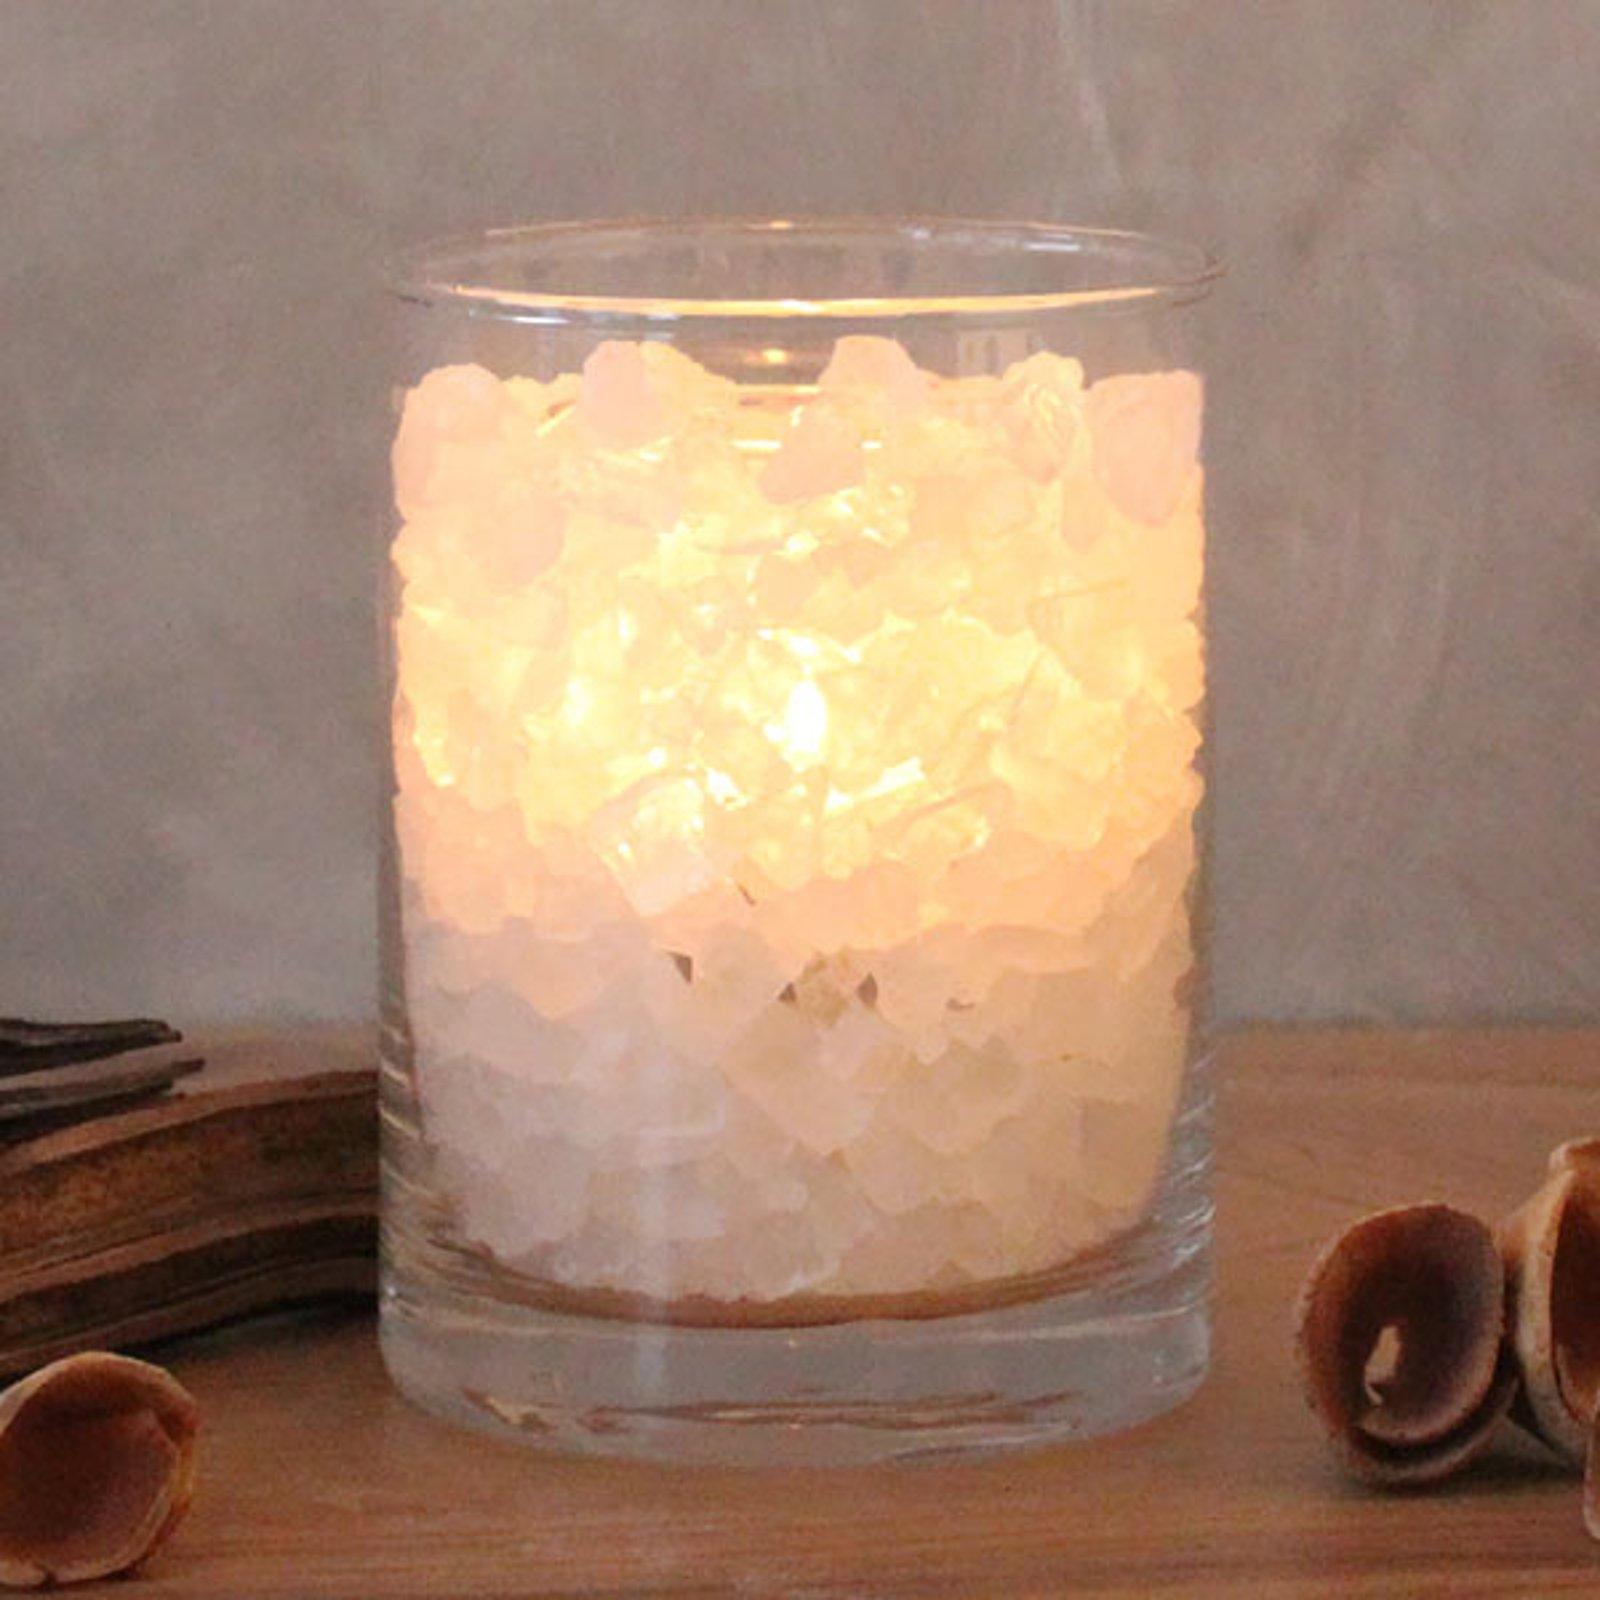 Saltkrystall polarildglass stearinlys av palmevoks